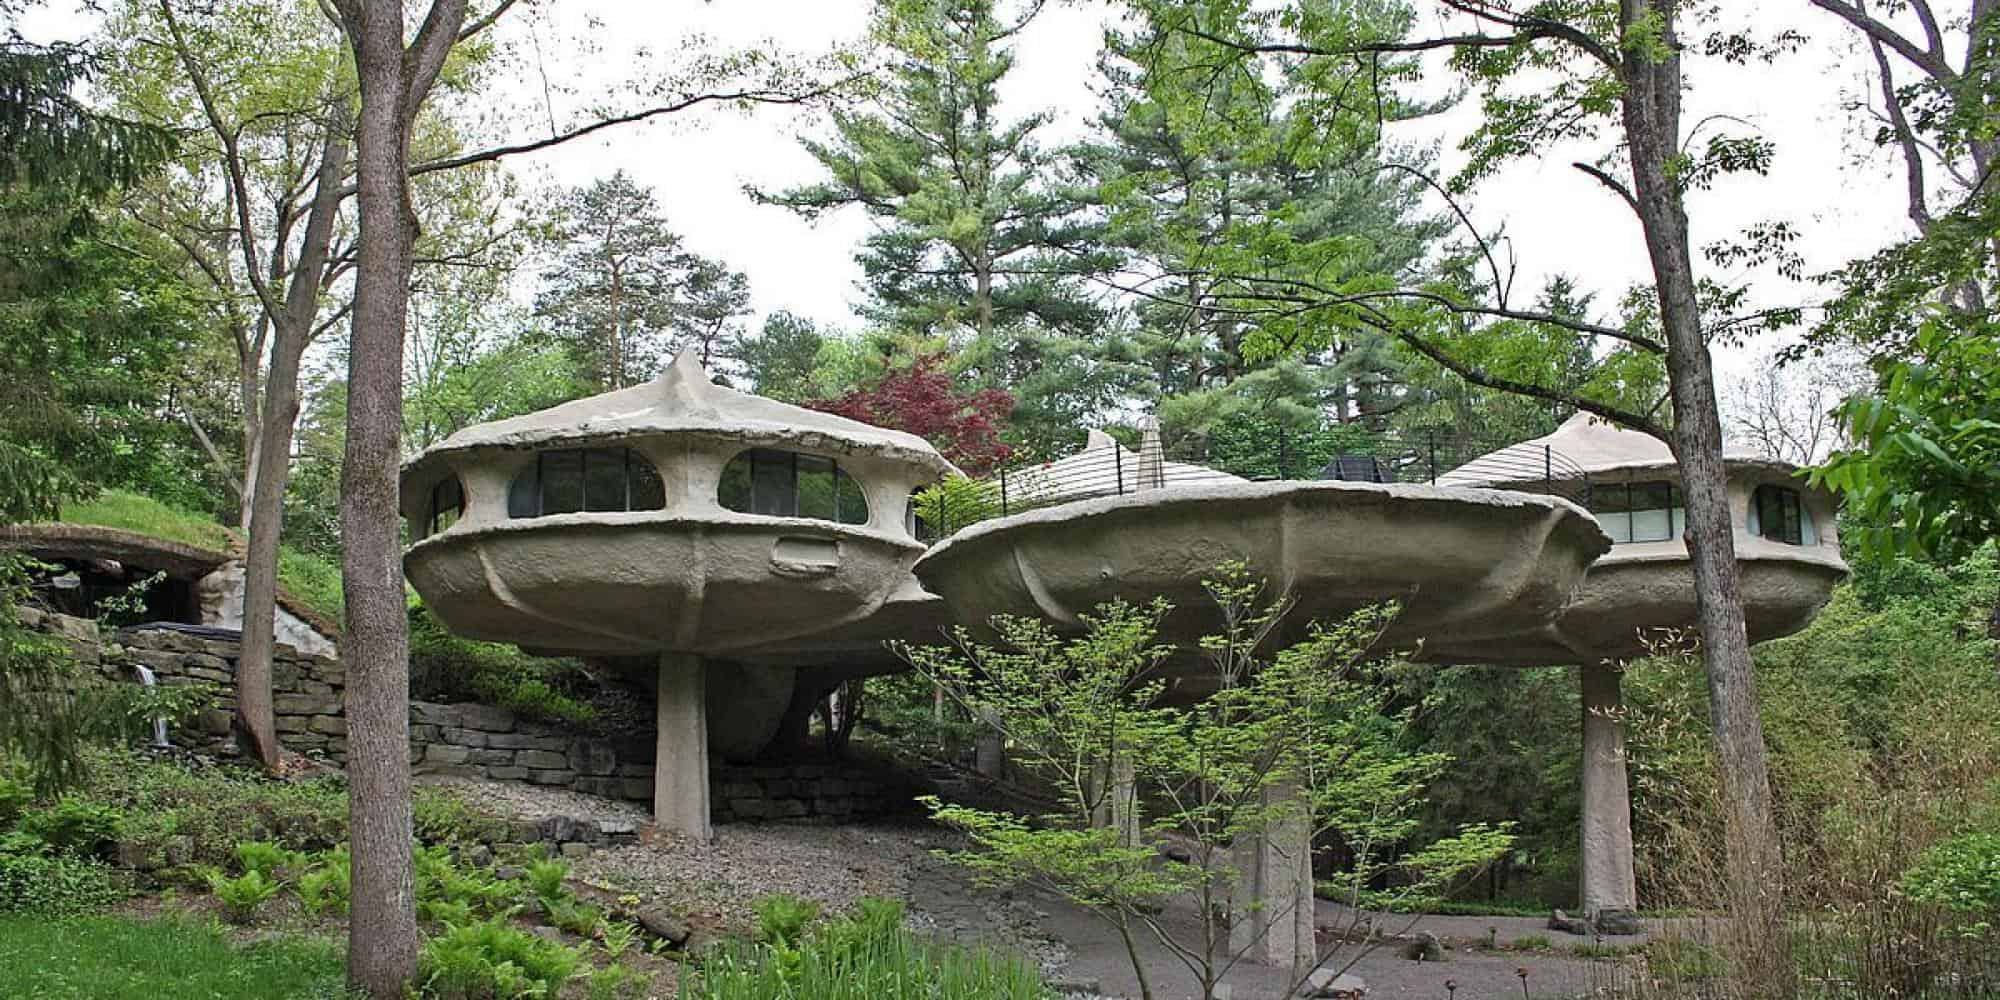 A complete tour of the mushroom house mushroomhouse publicscrutiny Gallery